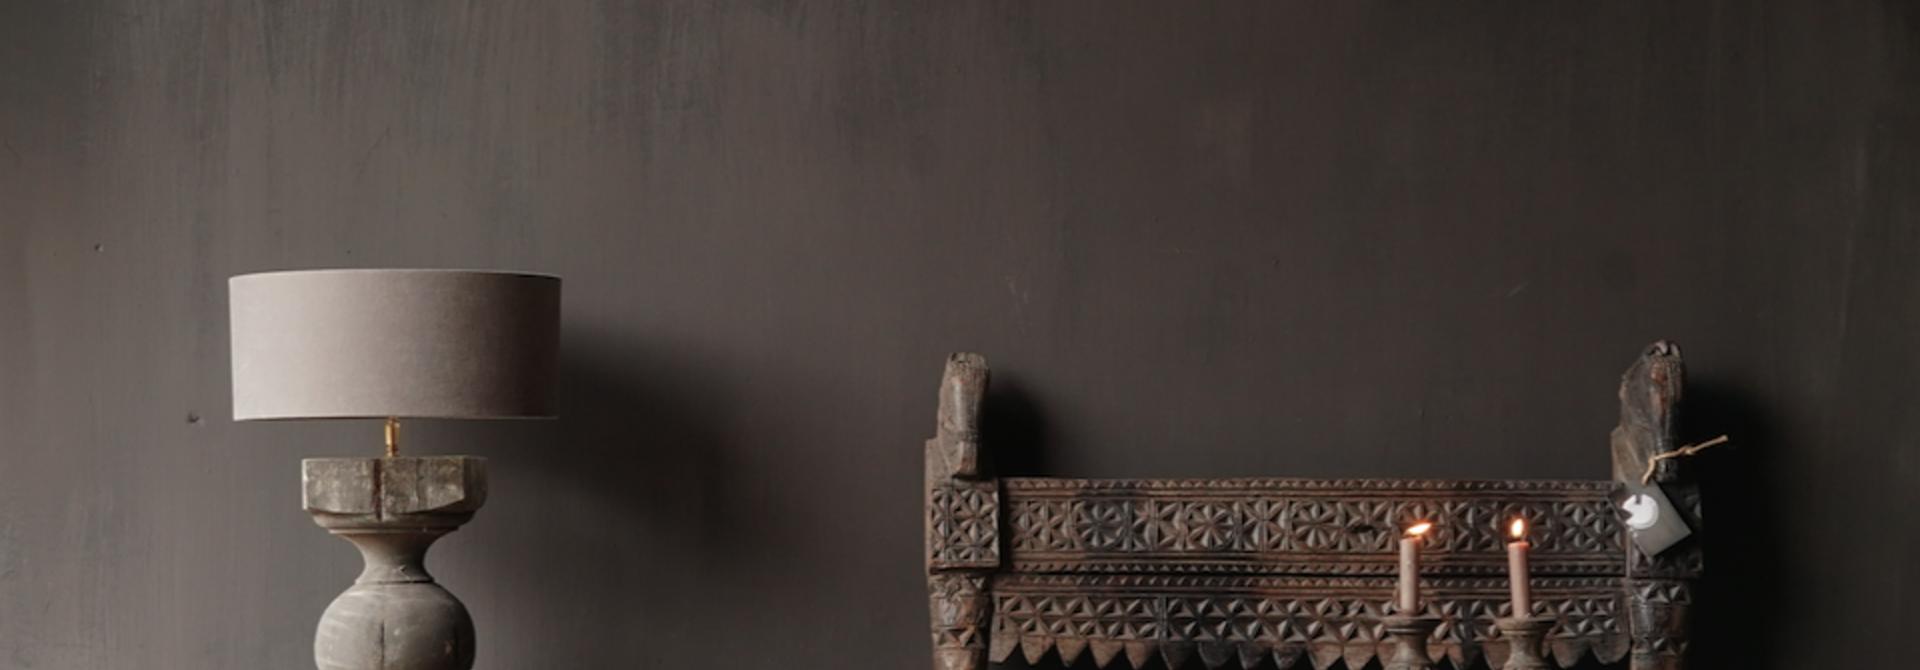 Stoer Tv Furniture / sideboard made of old wood